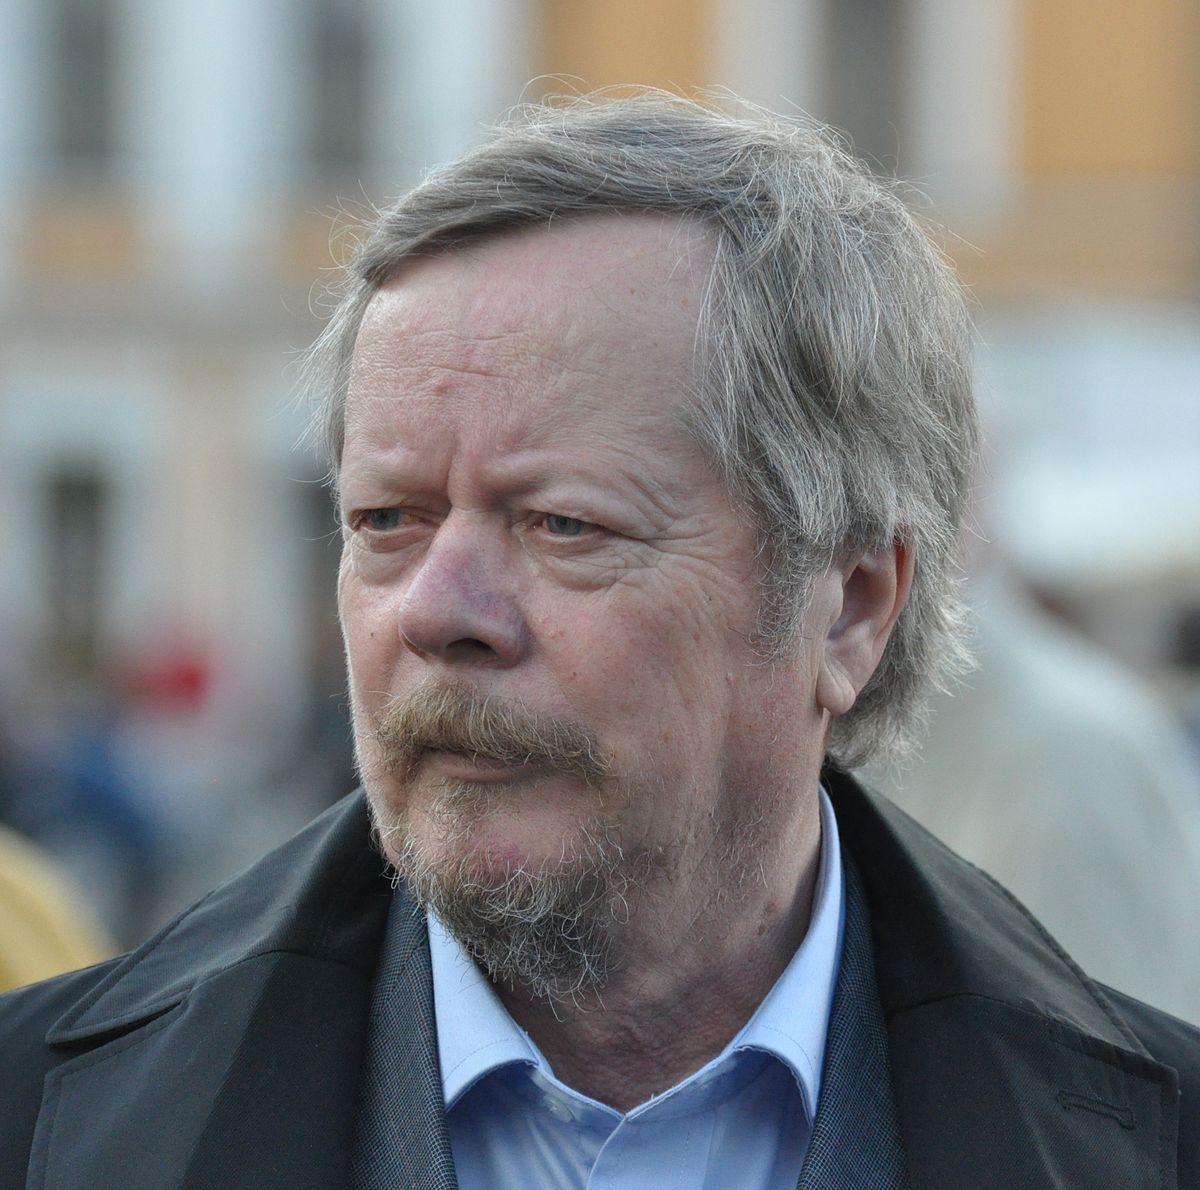 Reijo Tossavainen